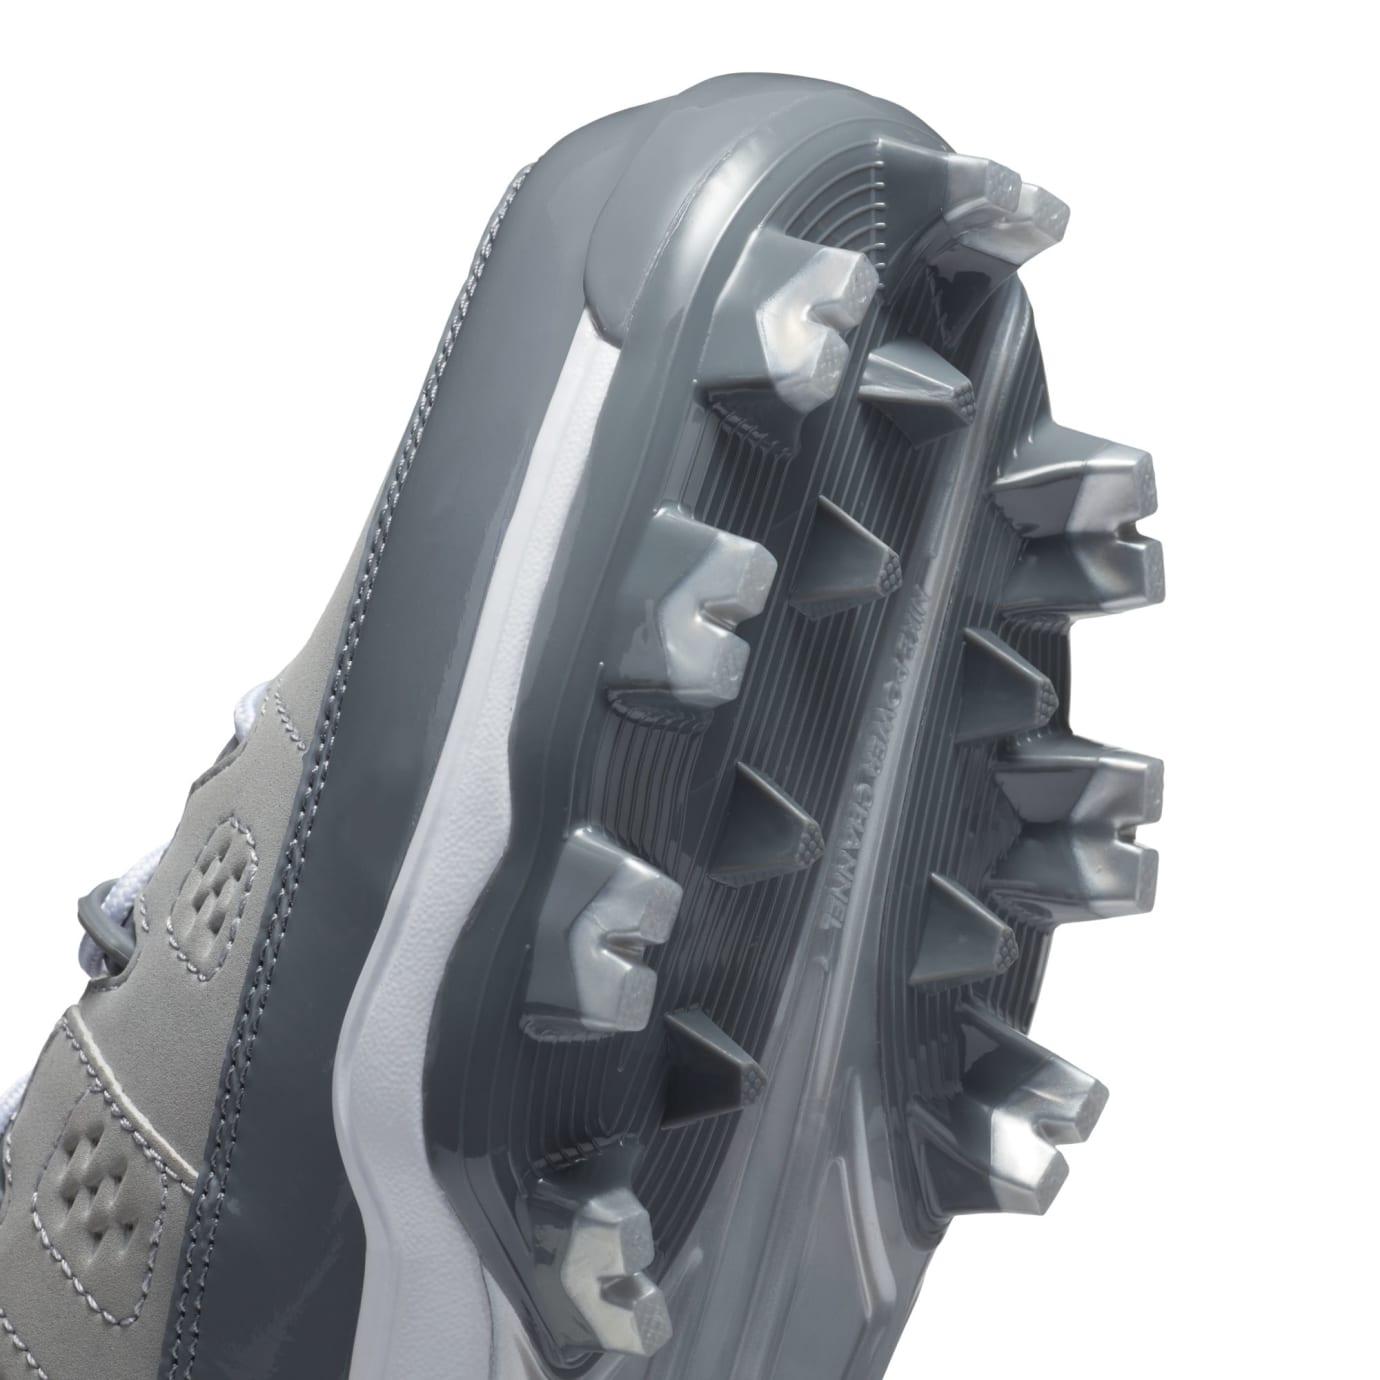 Air Jordan 9 IX MCS Baseball Cleats Cool Grey Cleat Plate